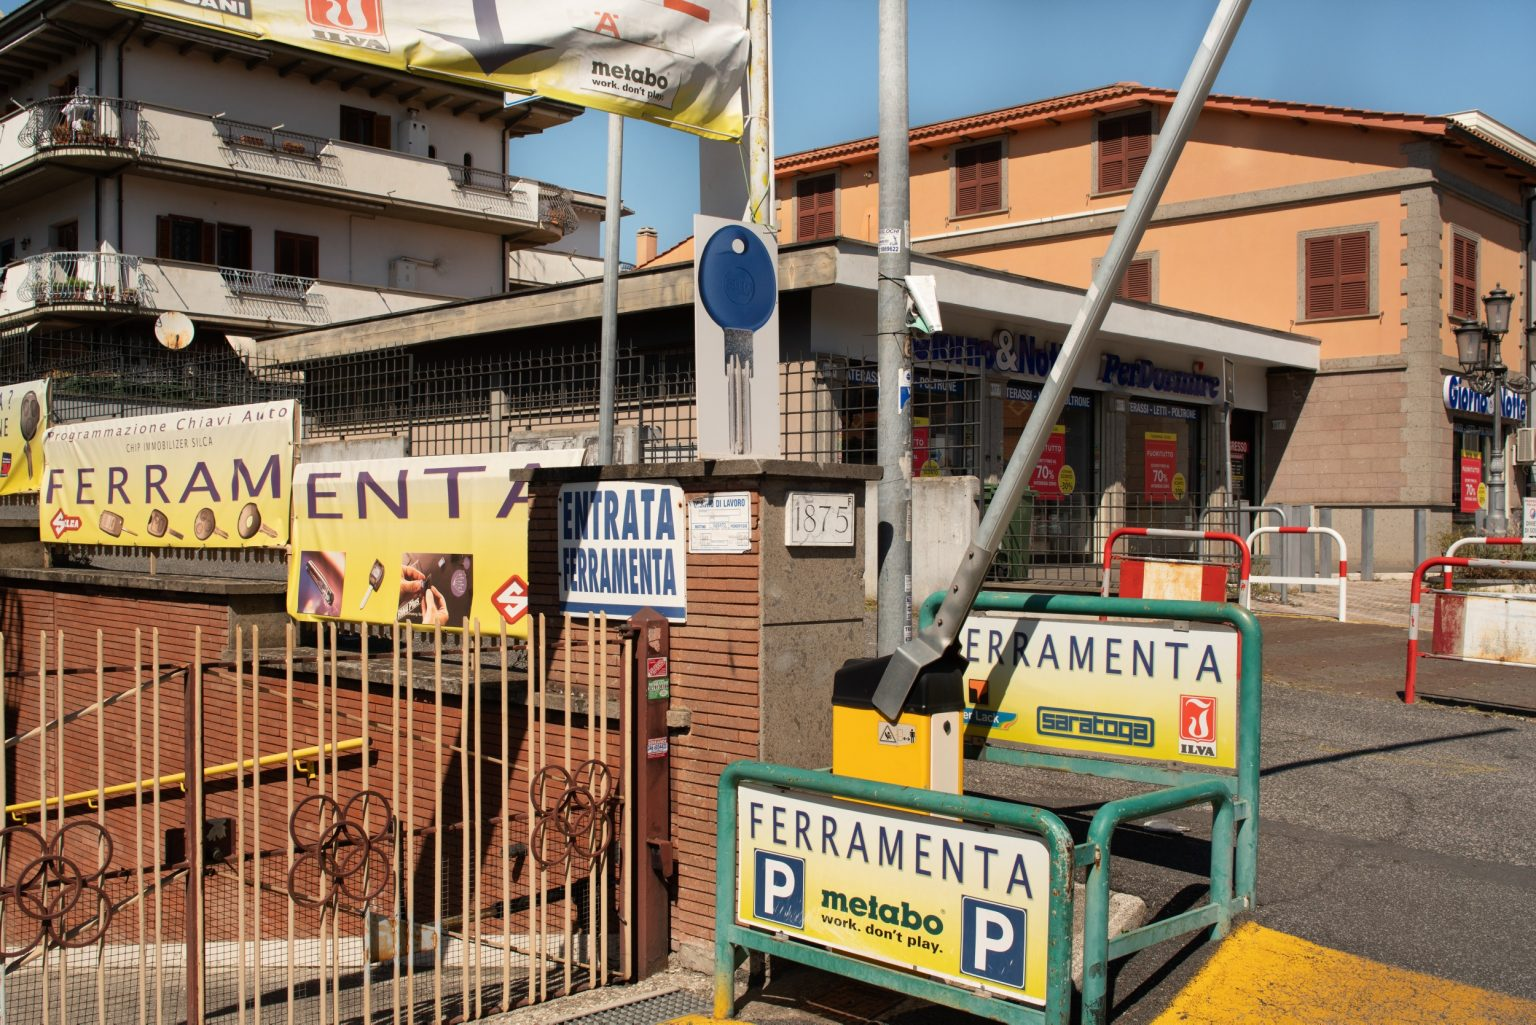 Via Calpurnio Fiamma, Casilino neighborhood. Rome, Italy, 2017